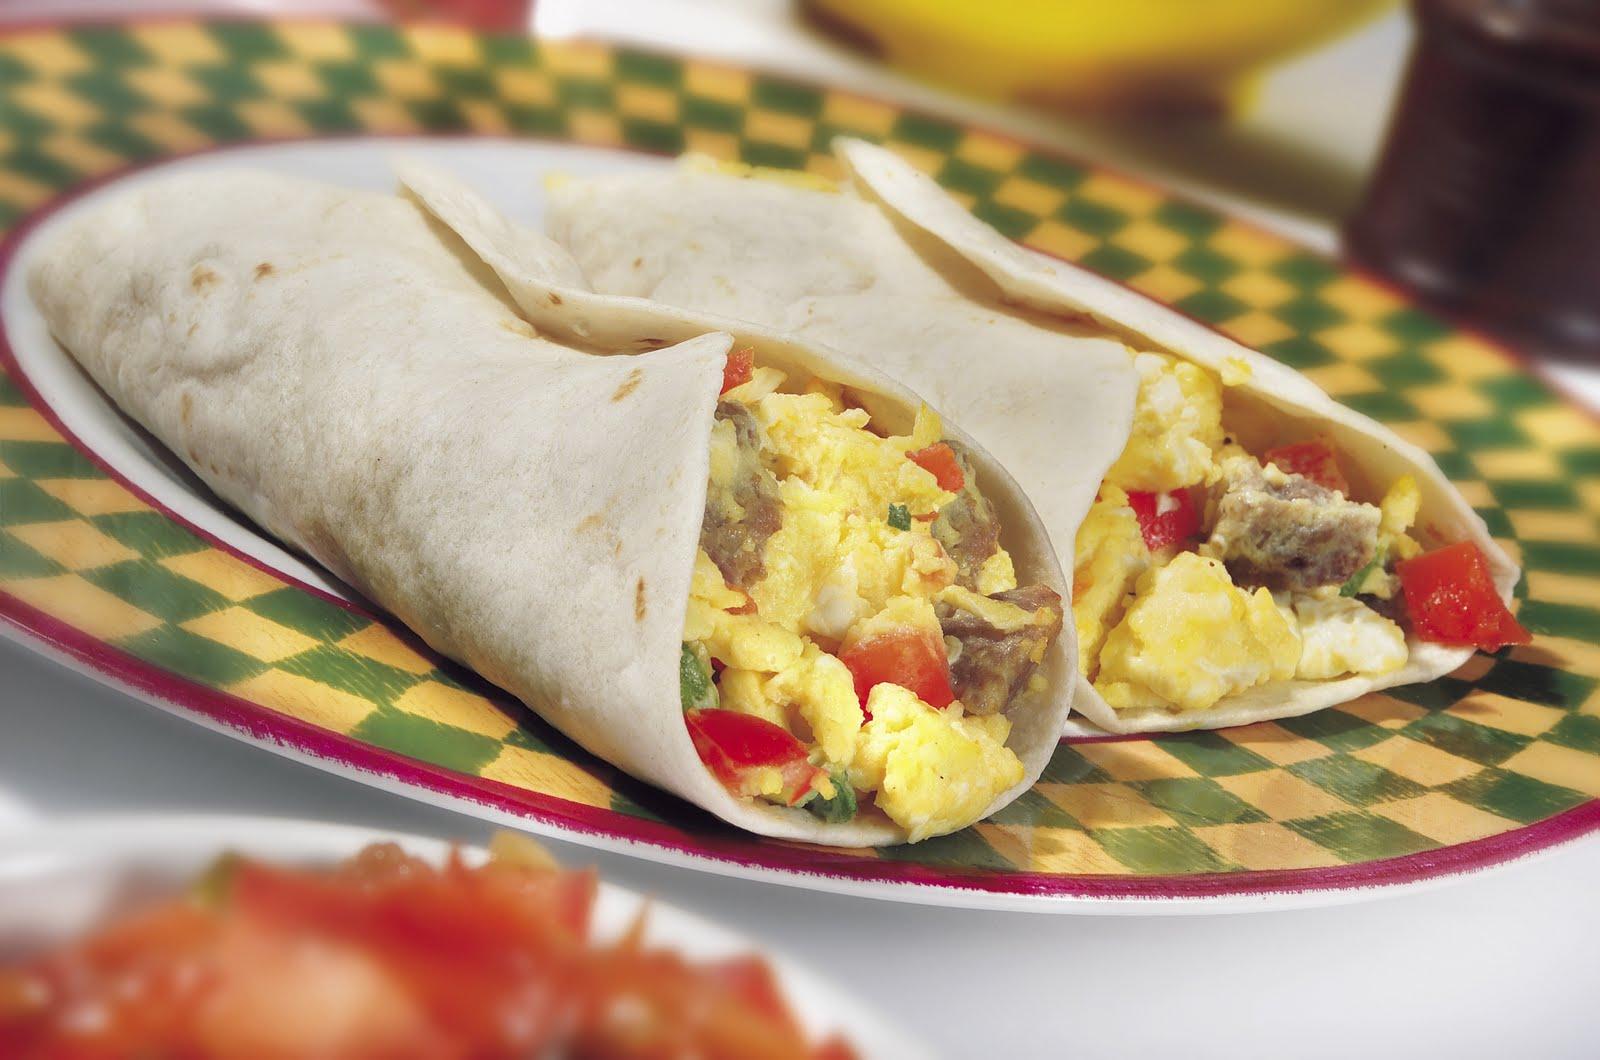 Breakfast Burrito On the Go